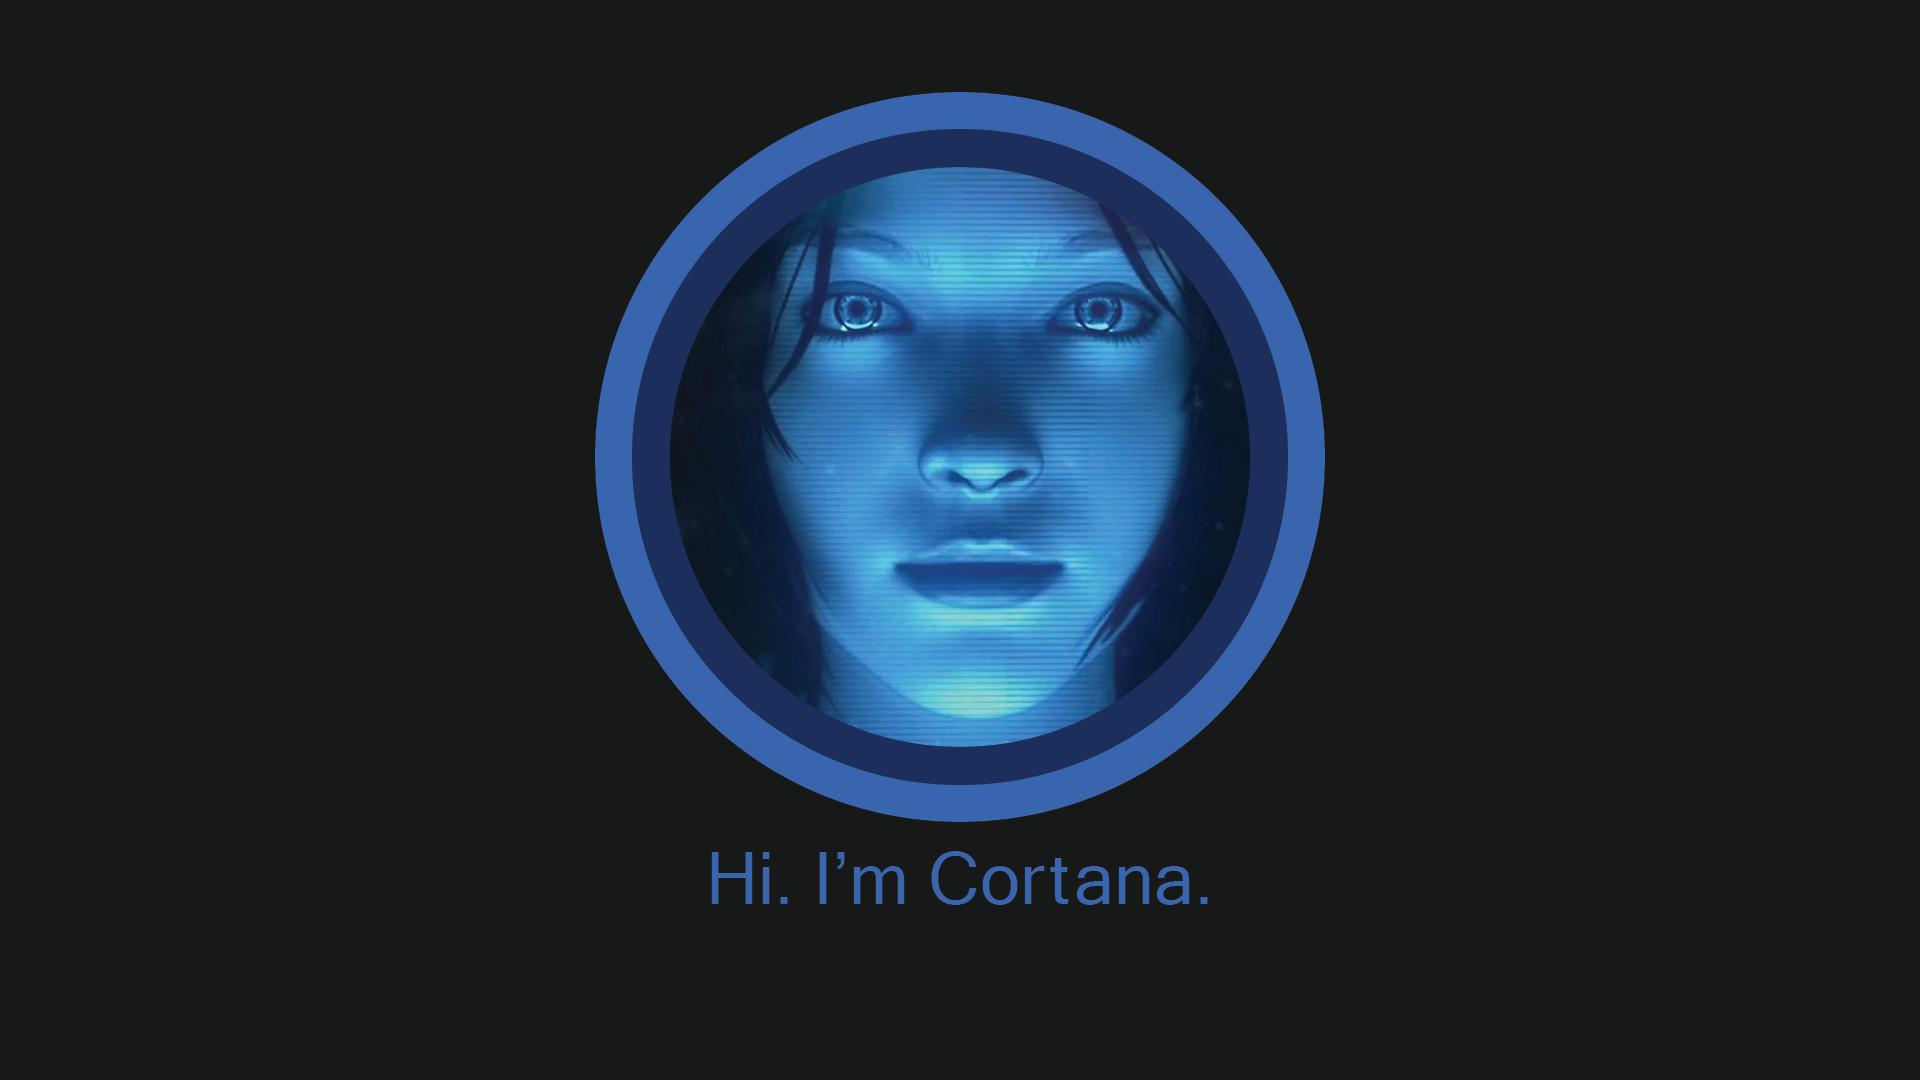 Cortana 4K Wallpaper 67 images 1920x1080